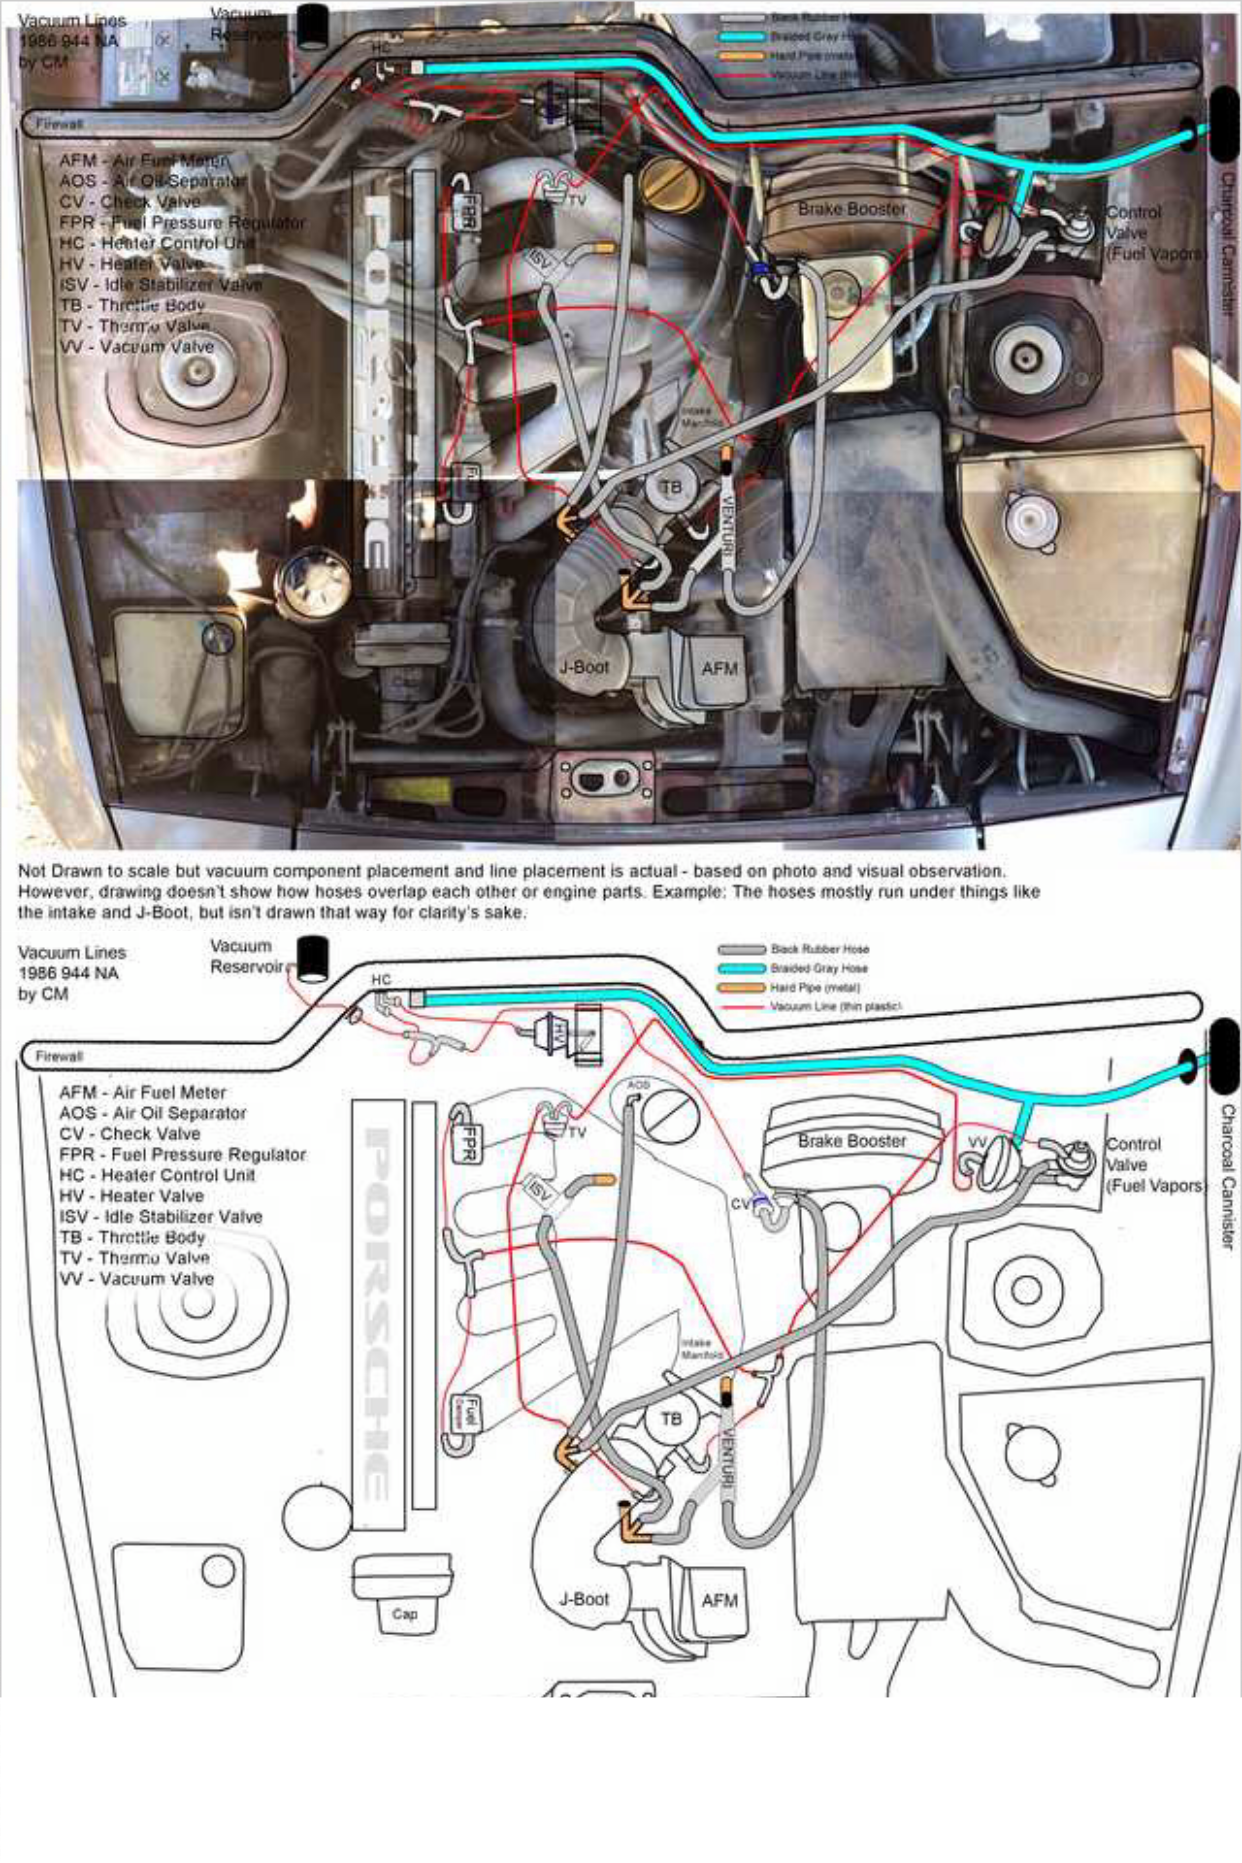 1986 porsche 944 vacuum line diagram overlay porsche transaxles 1986 porsche 944 vacuum line diagram overlay [ 1242 x 1863 Pixel ]